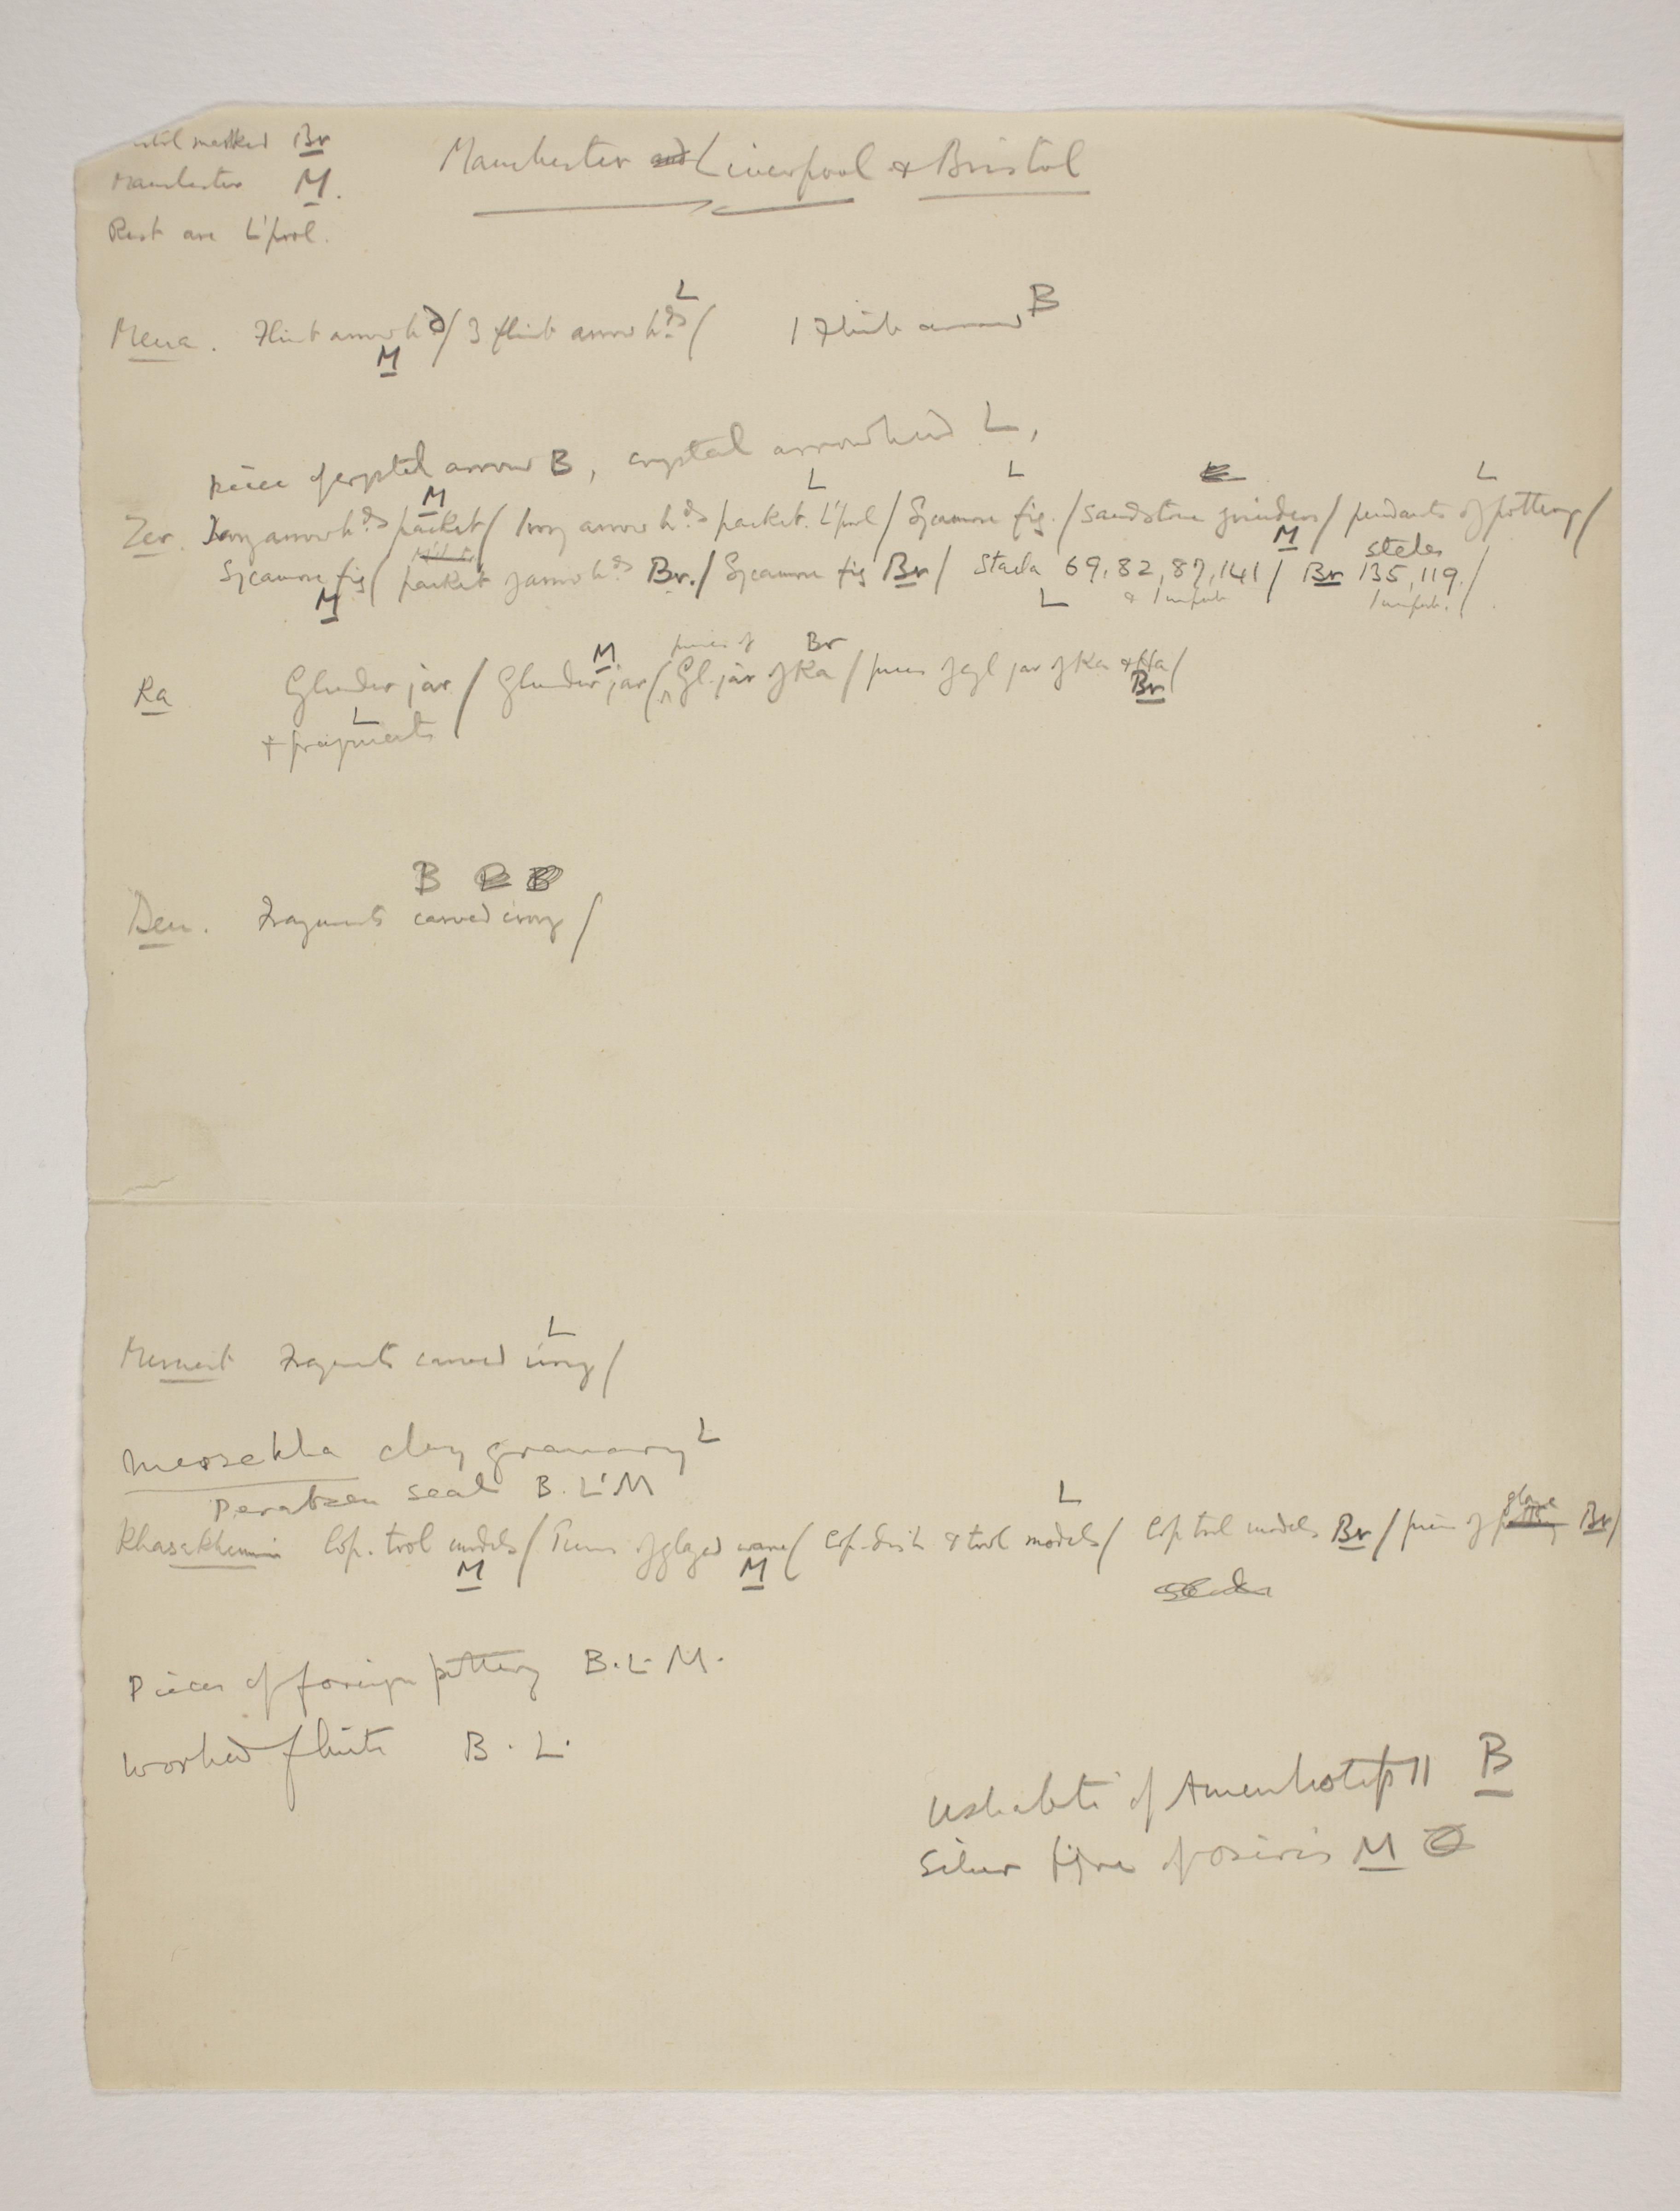 Abydos, Bet Khallaf, el-Mahasna 1900-1901, Multiple Institution List, PMA/WFP1/D/9/26